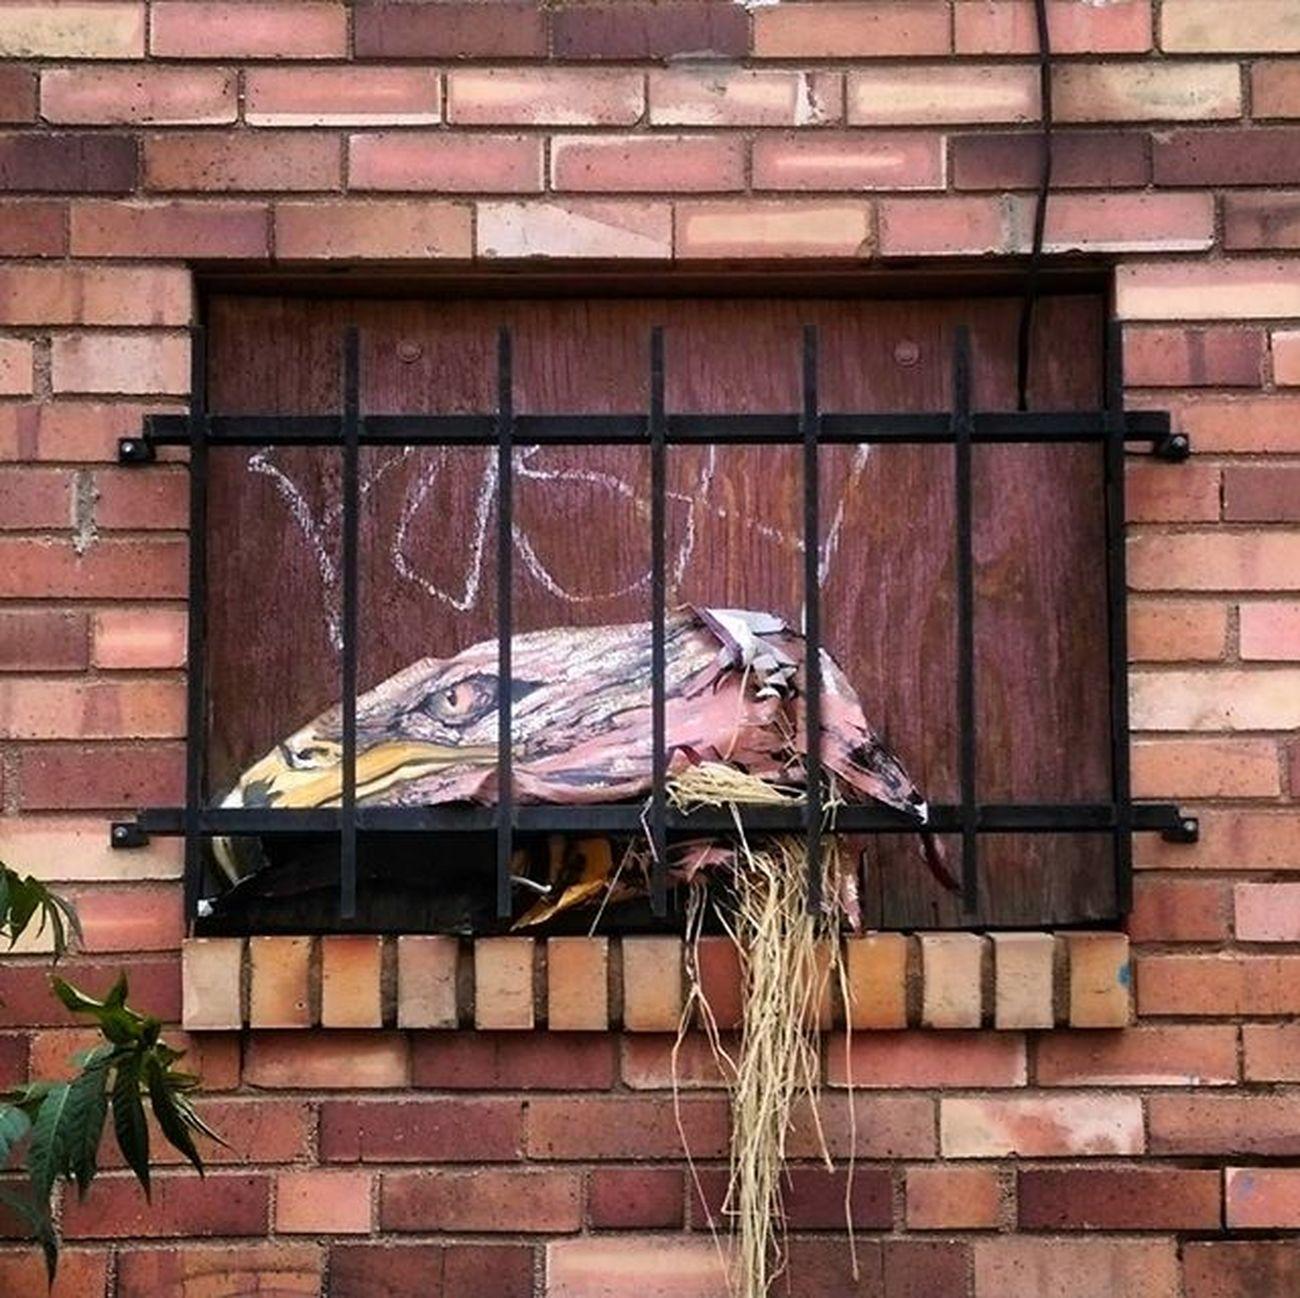 Streetart Denverstreetart Tags Denvertags Wheatpaste Pasteups Pasteup Windows Windowporn Eagleart